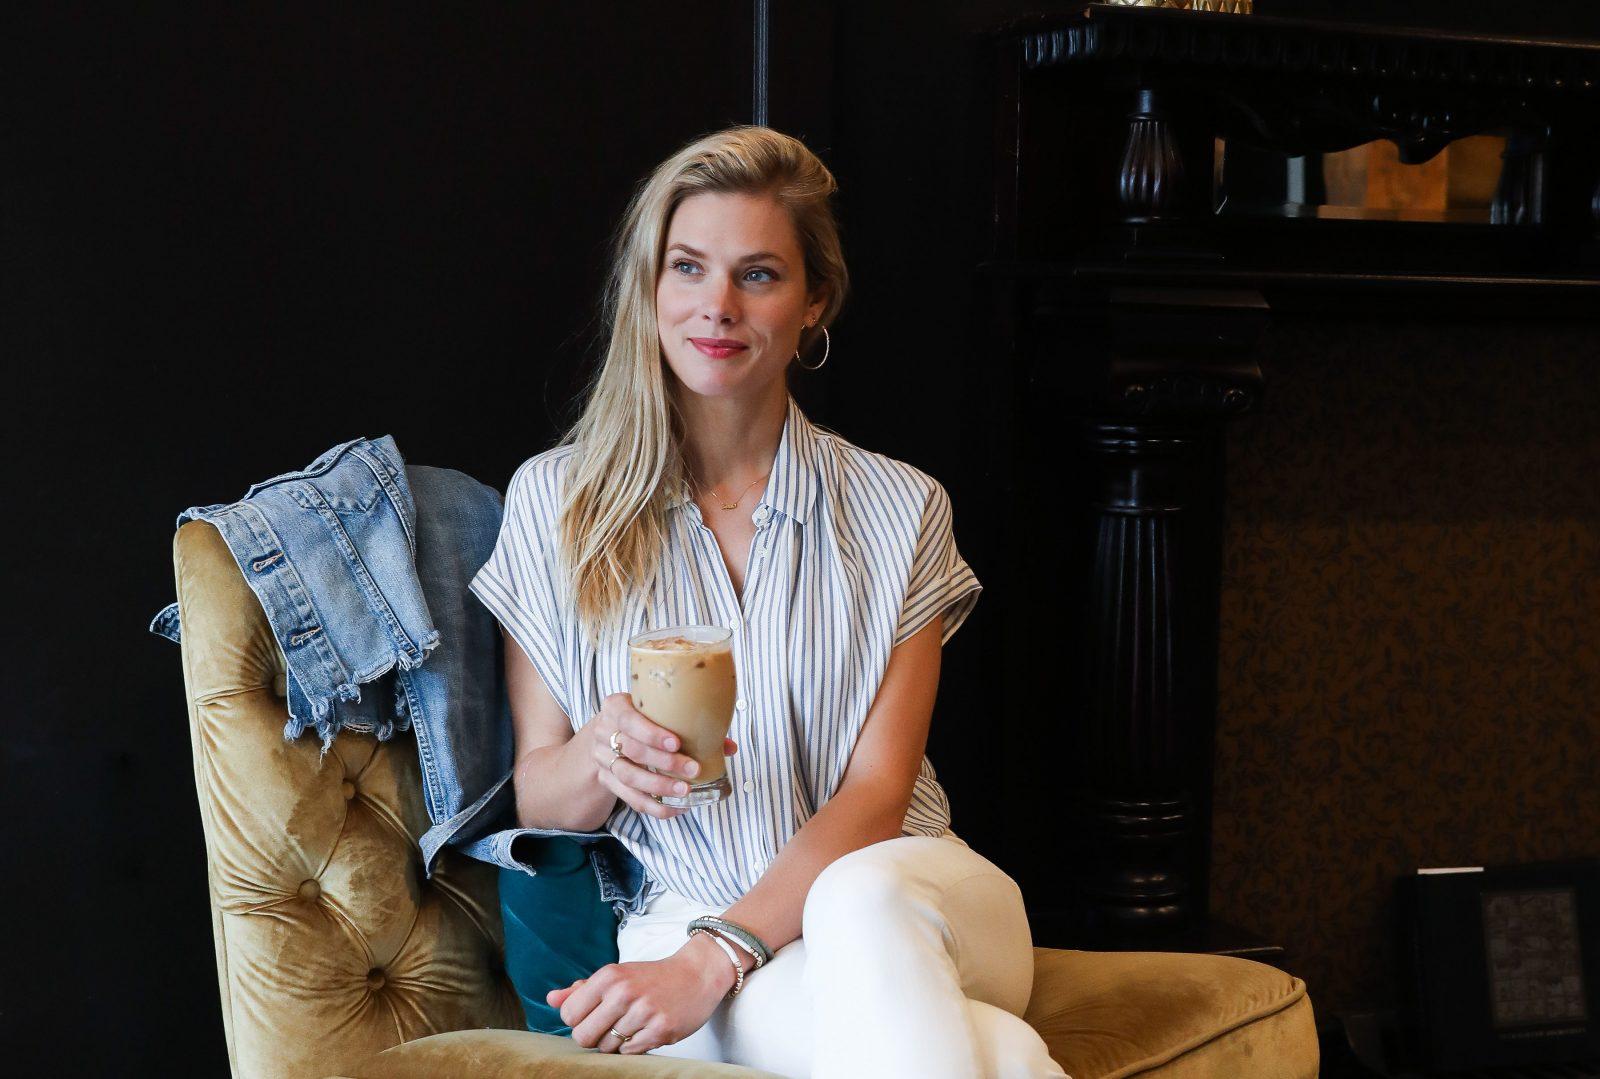 Laura Lea Bryant - Holistic Nashville Chef and Author of The Laura Lea Balanced Cookbook